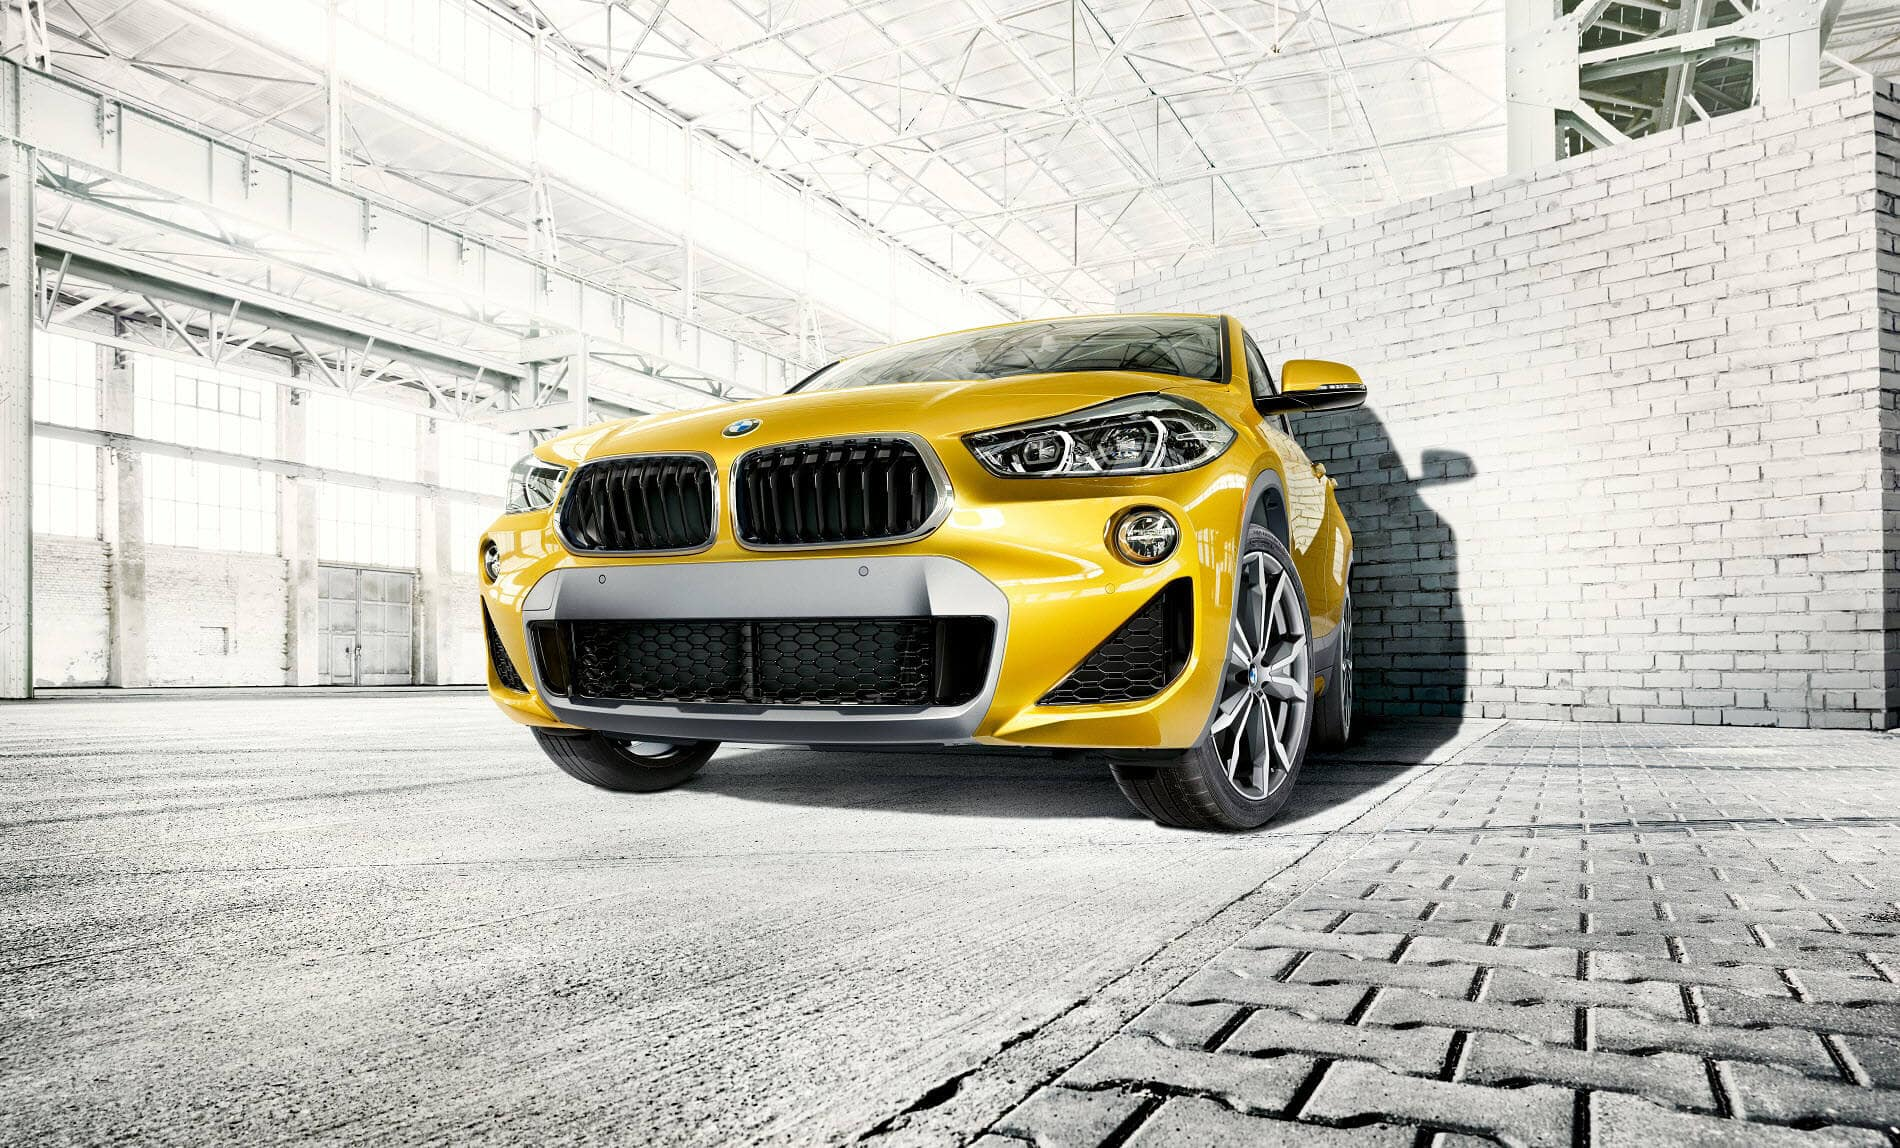 BMW X2 Galvanic Gold Metallic